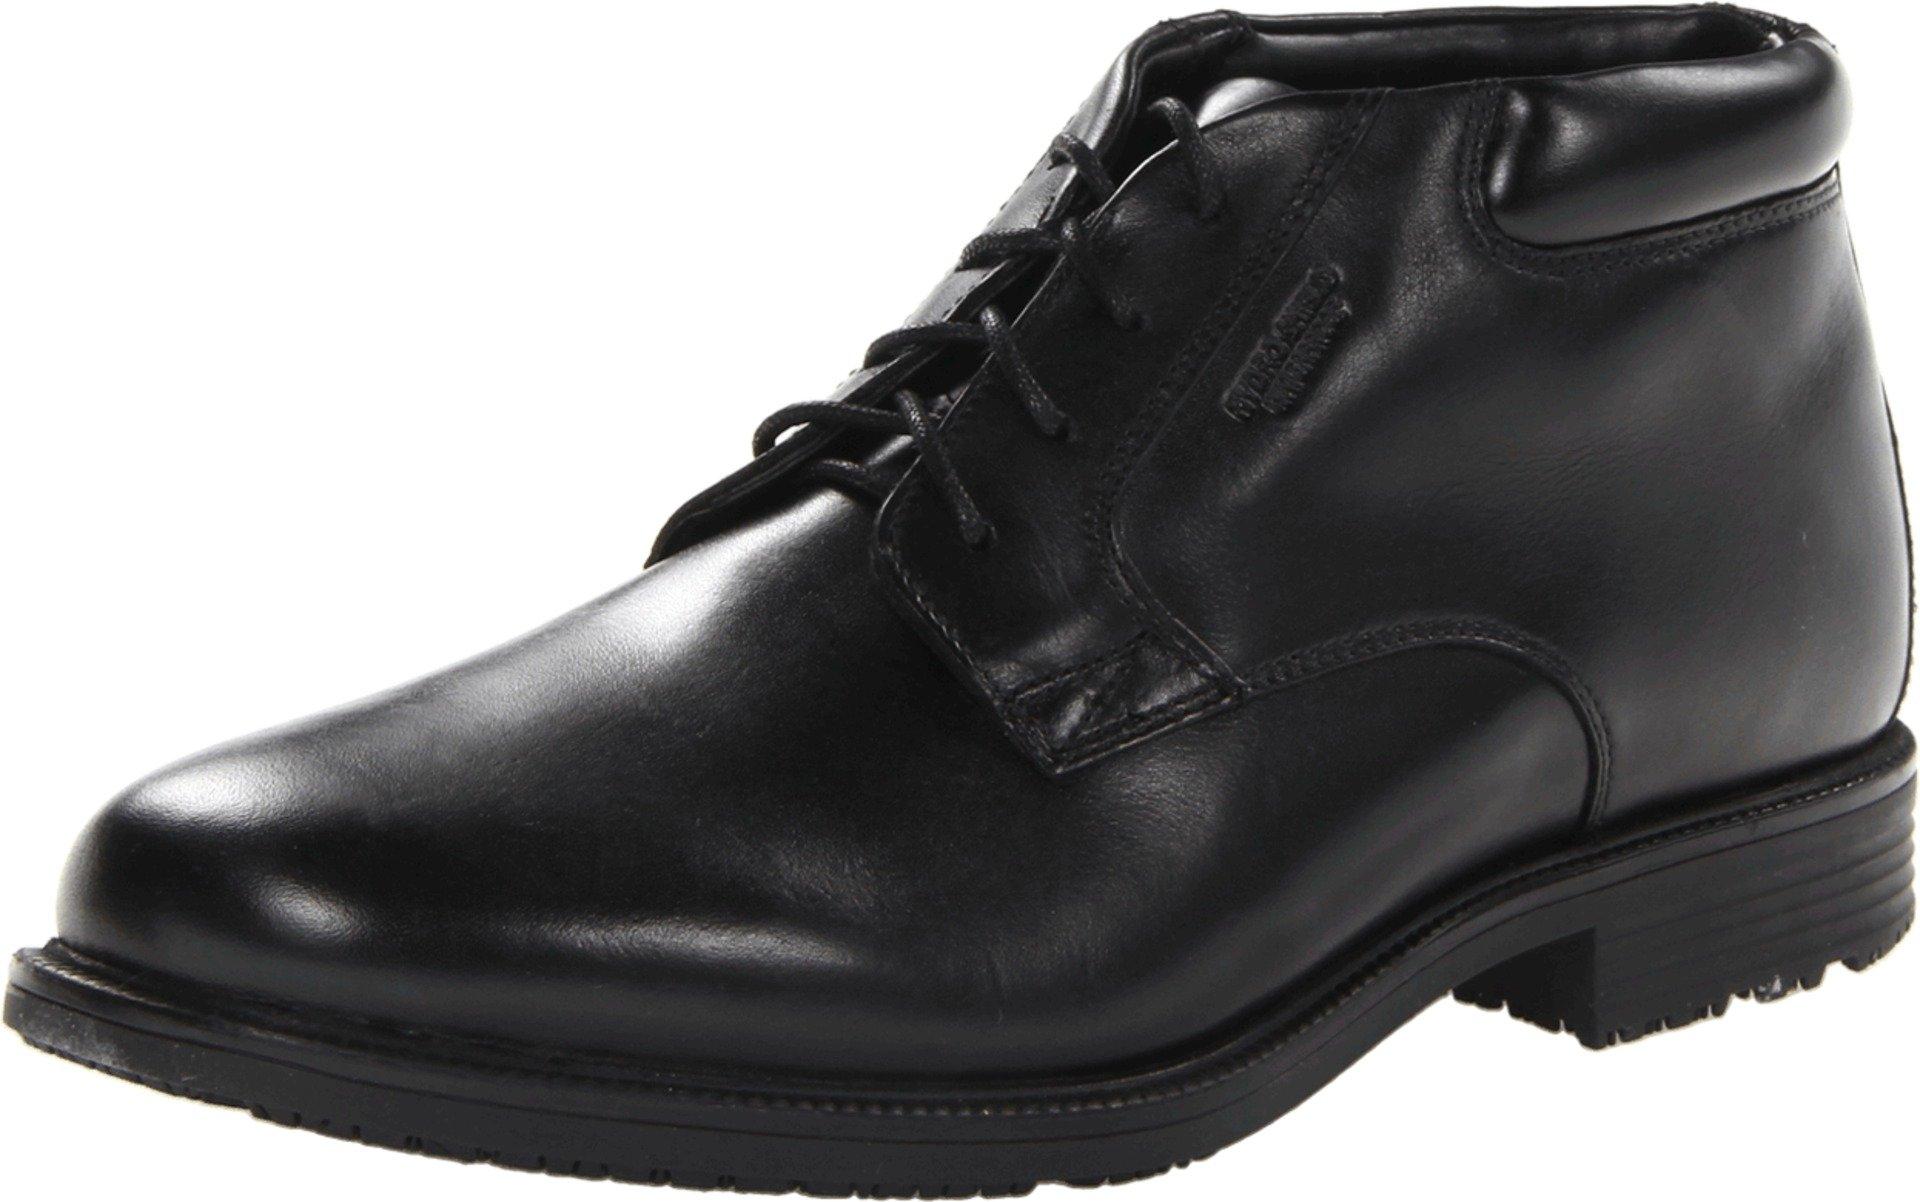 Rockport Men's Essential Details Waterproof Dress Chukka Boot,Black,10.5 W US by Rockport